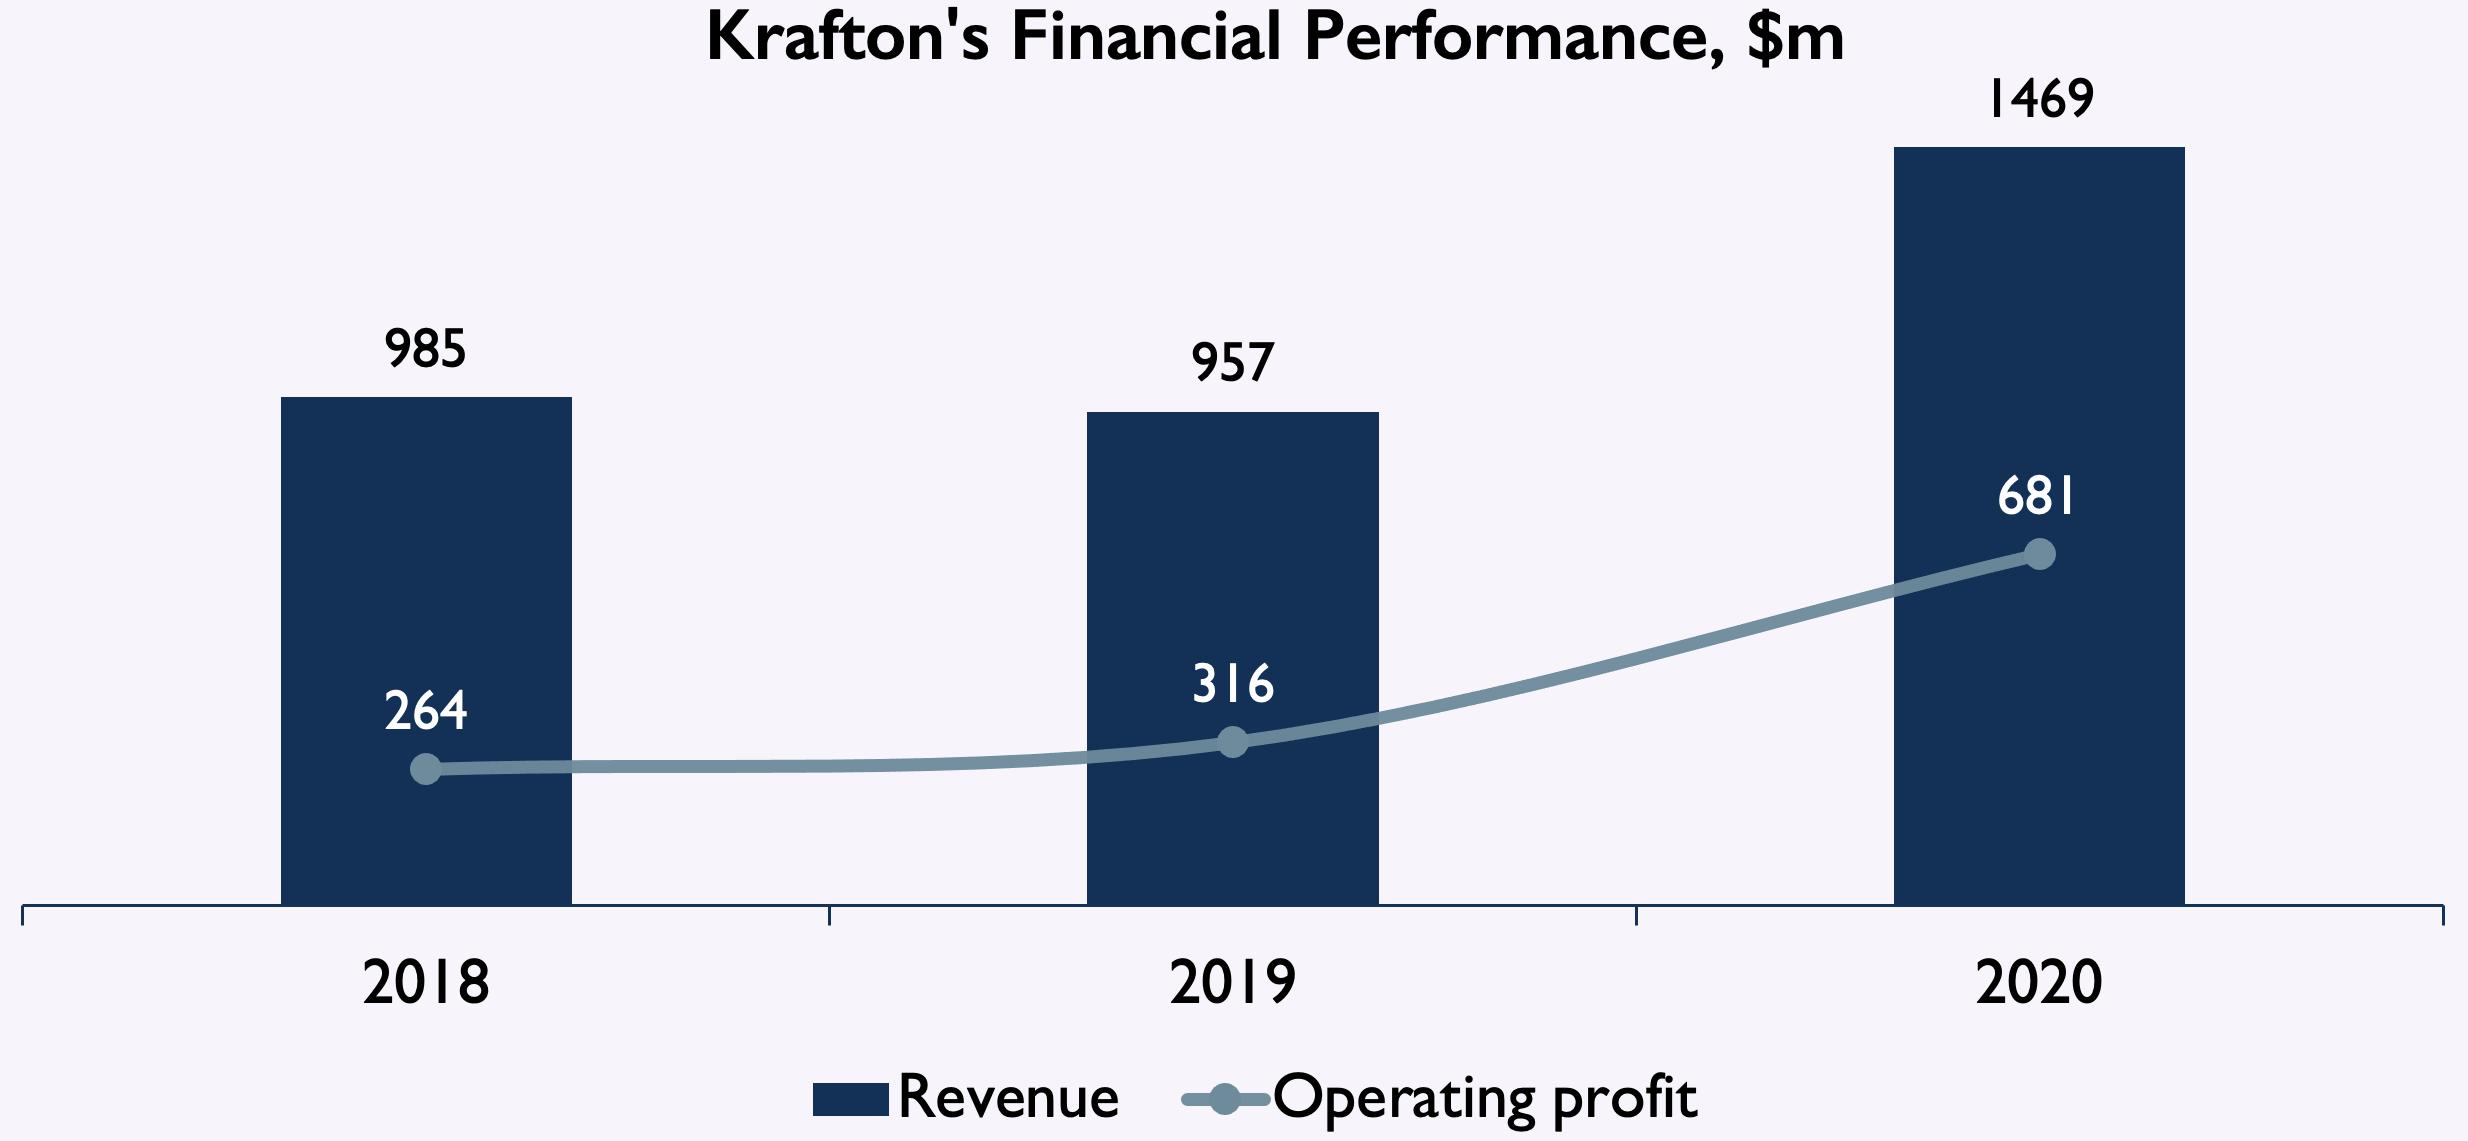 Krafton Financial